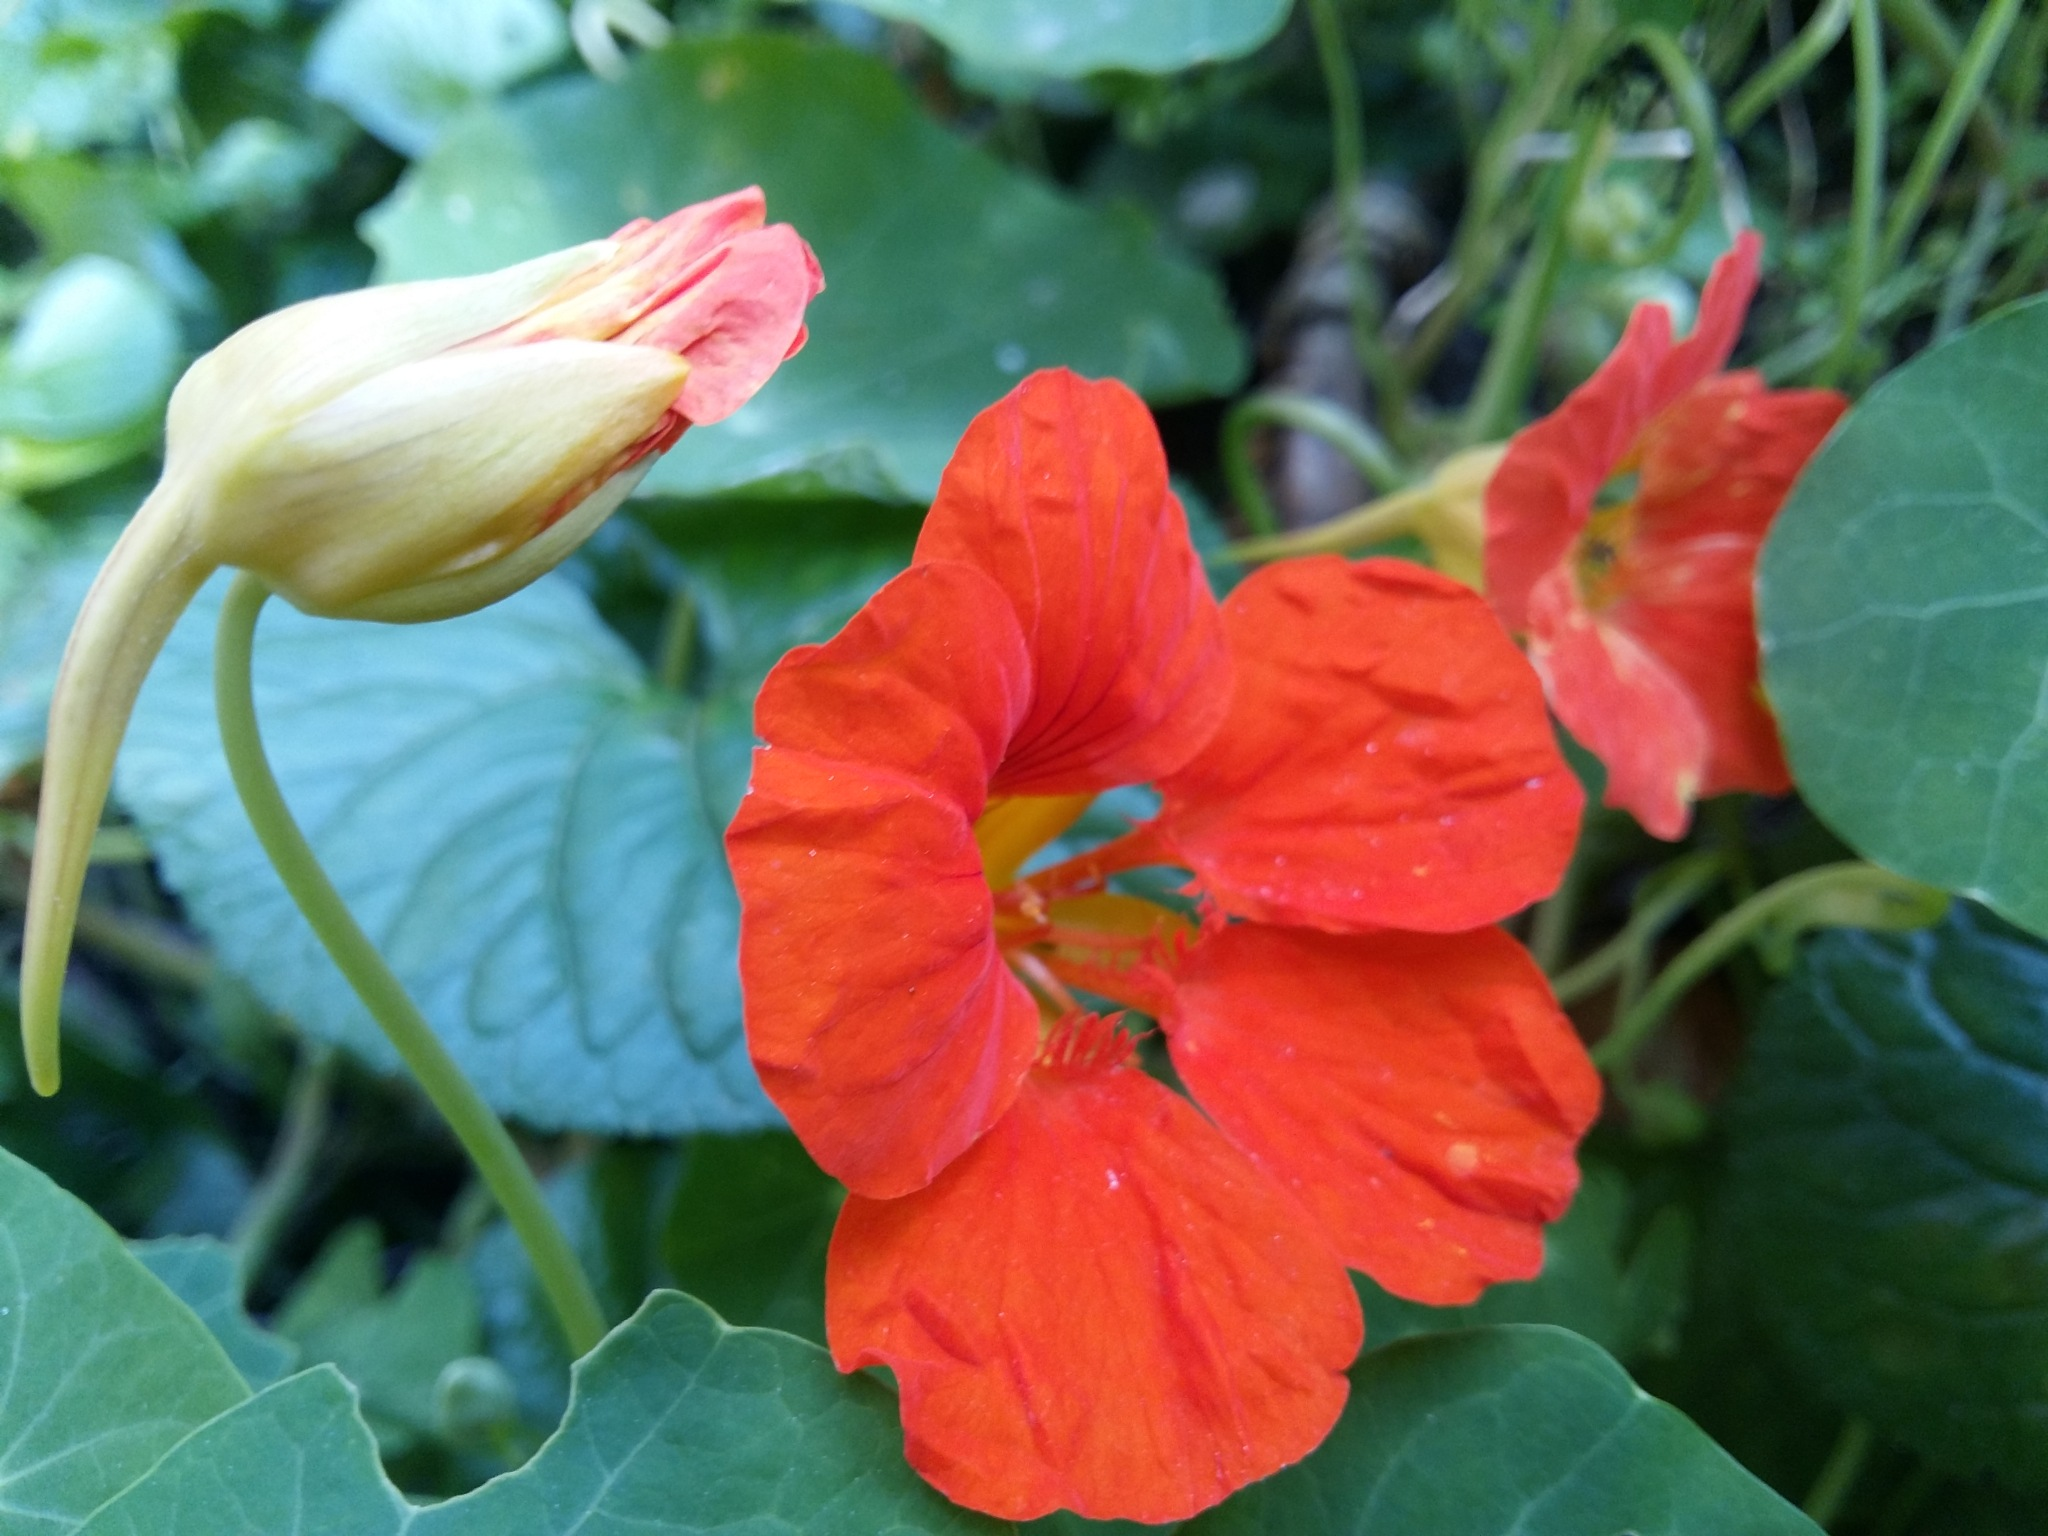 Orange flowers by uzkuraitiene62